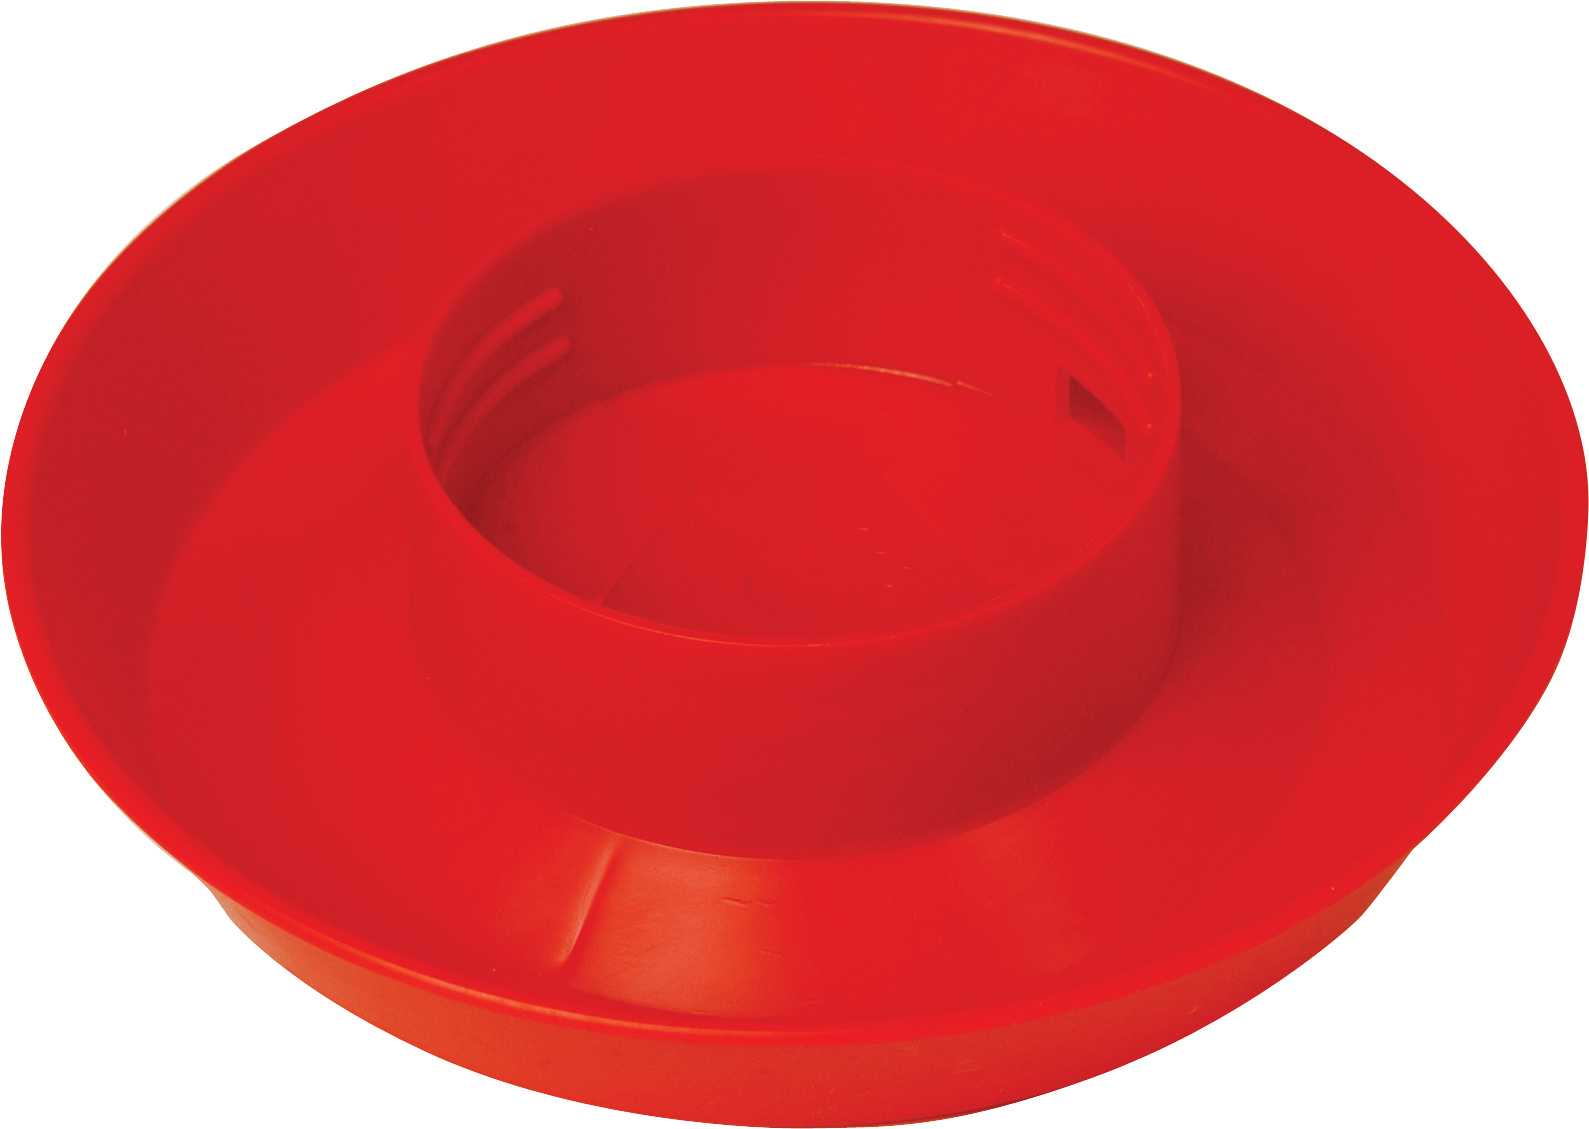 Miller Little Giant Screw-On Poultry Waterer Base, Red, 1-quart